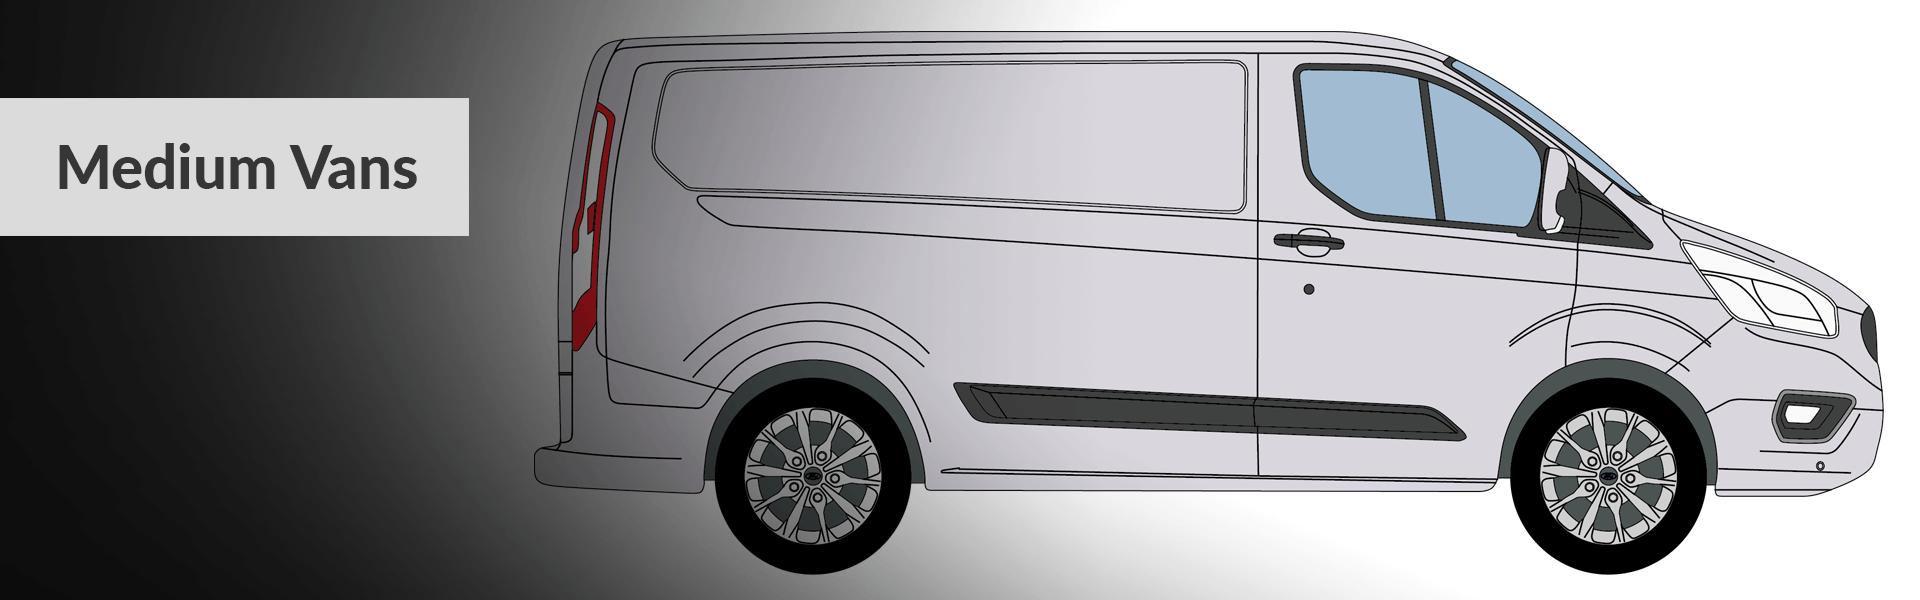 Medium Vans Desktop